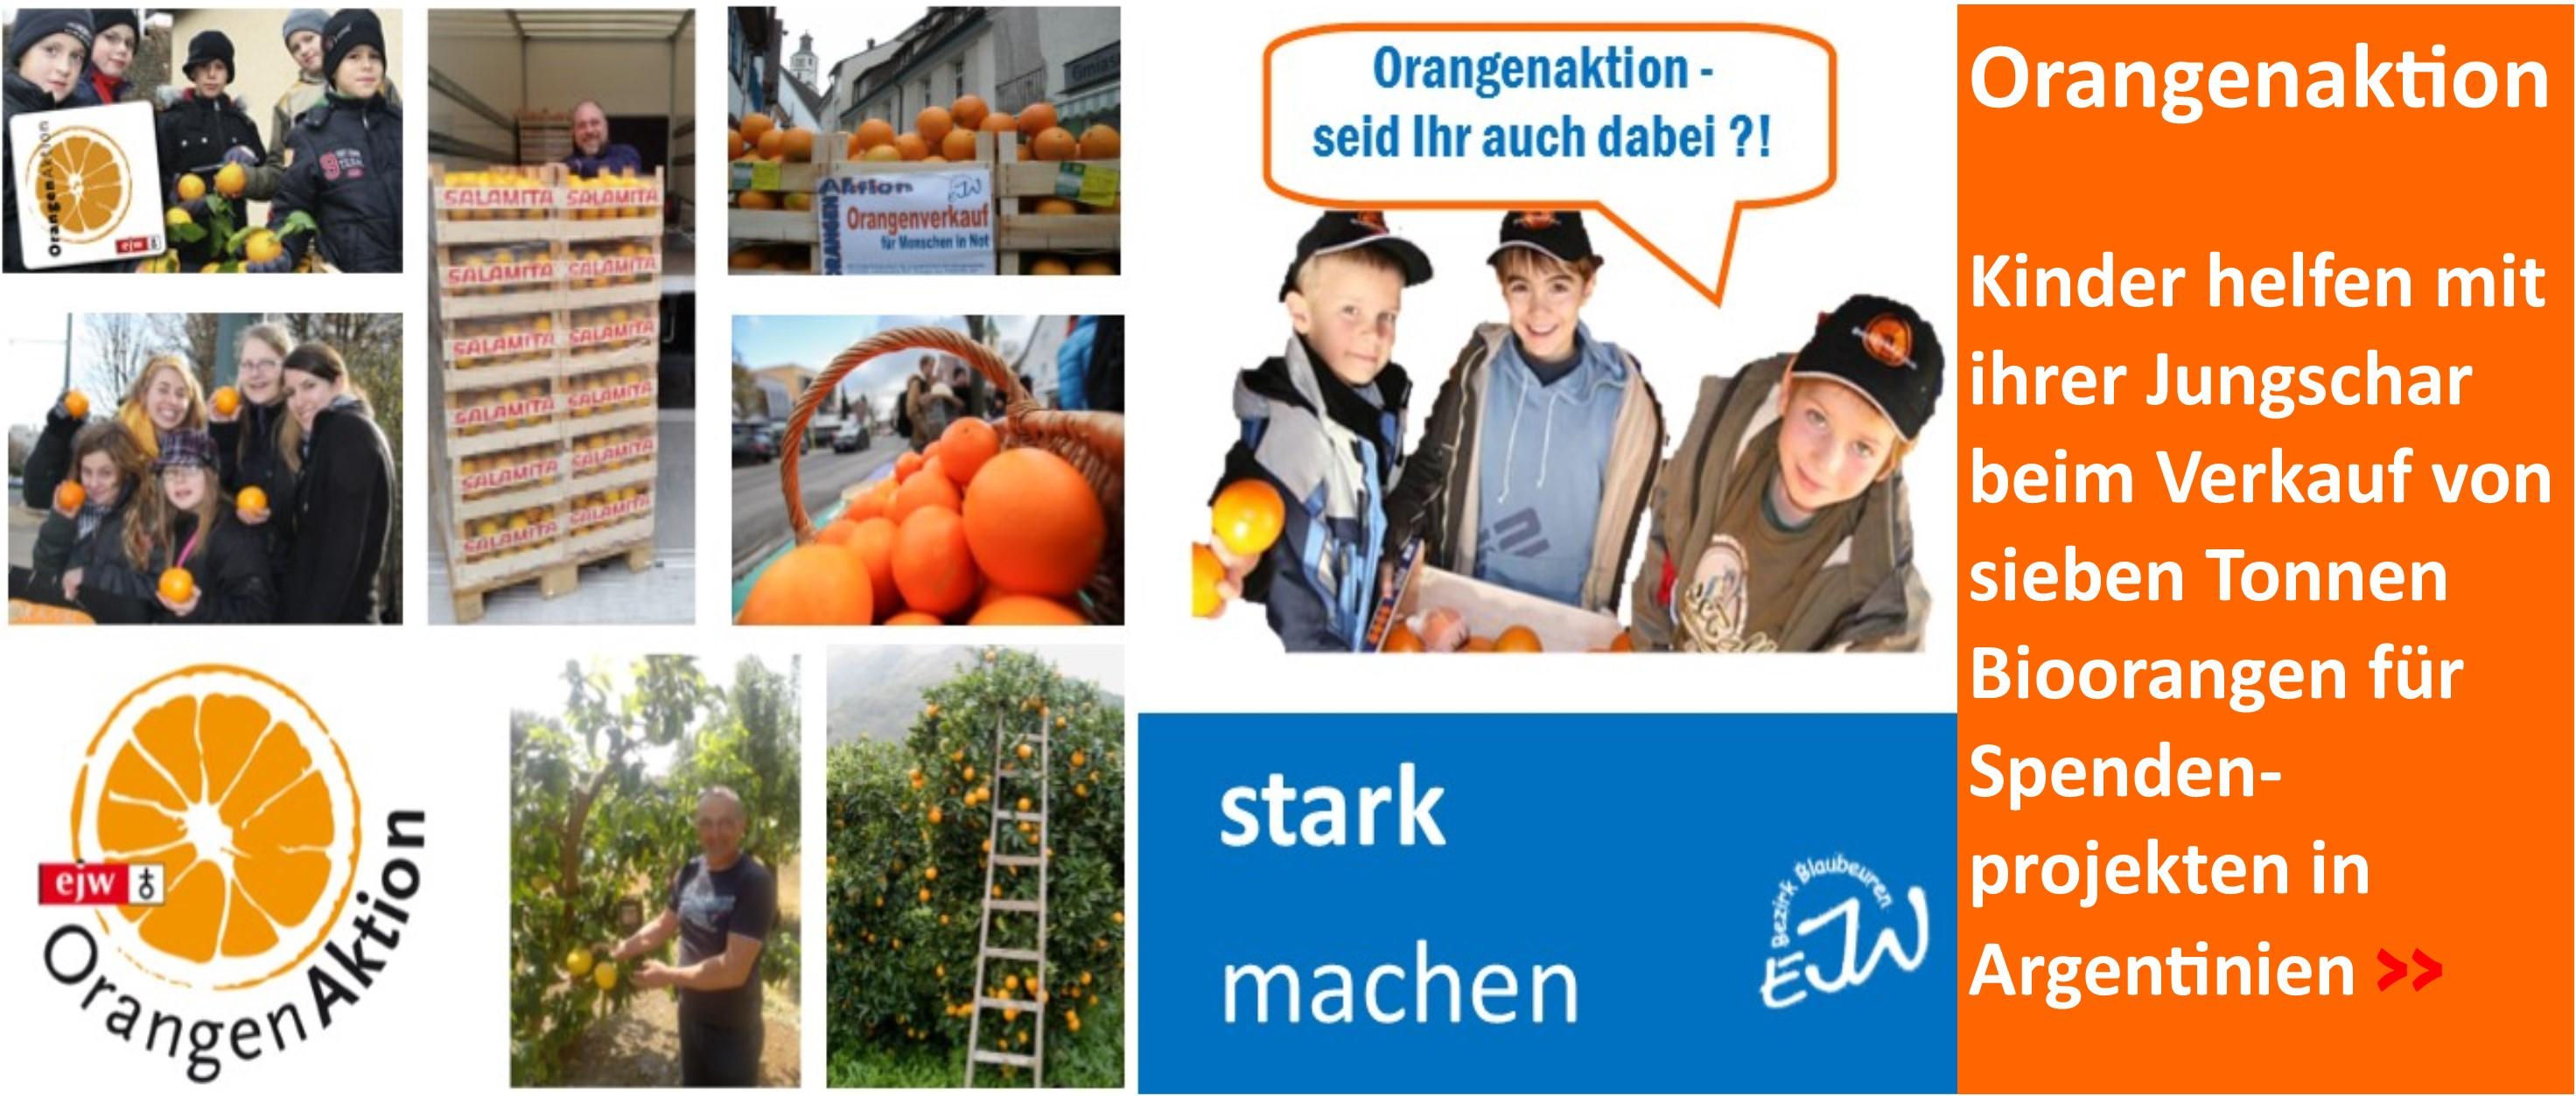 orangenaktion_titel